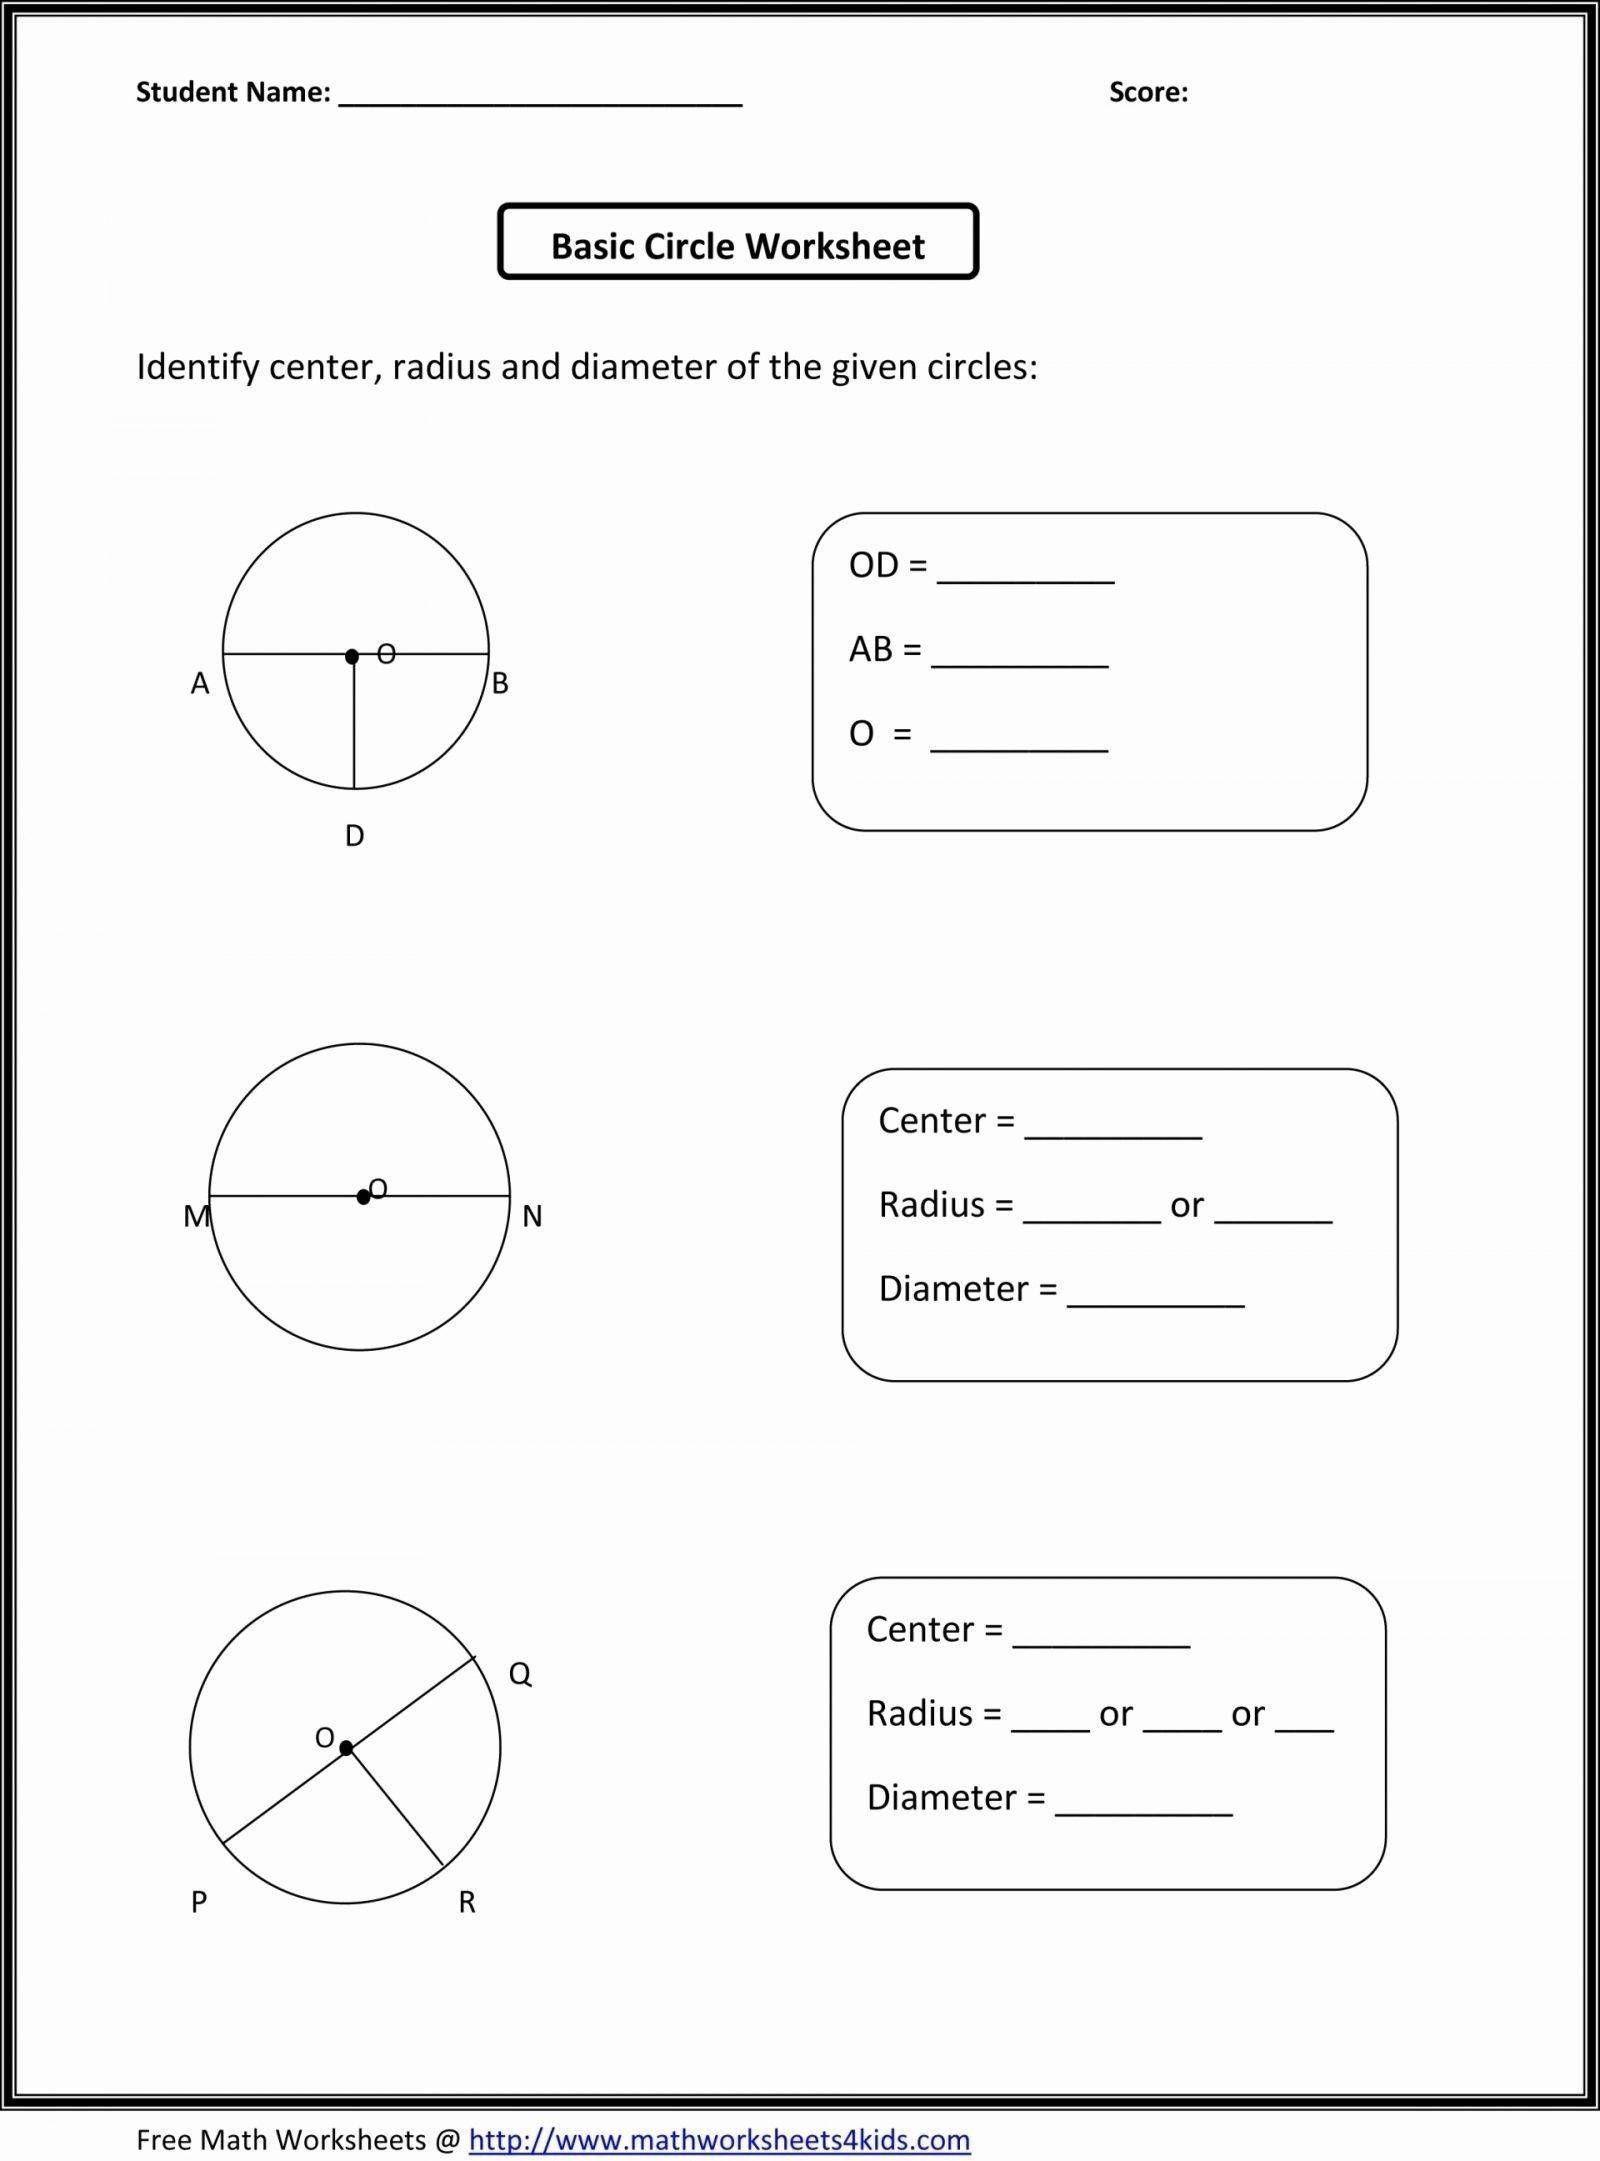 6 Free Math Printouts In